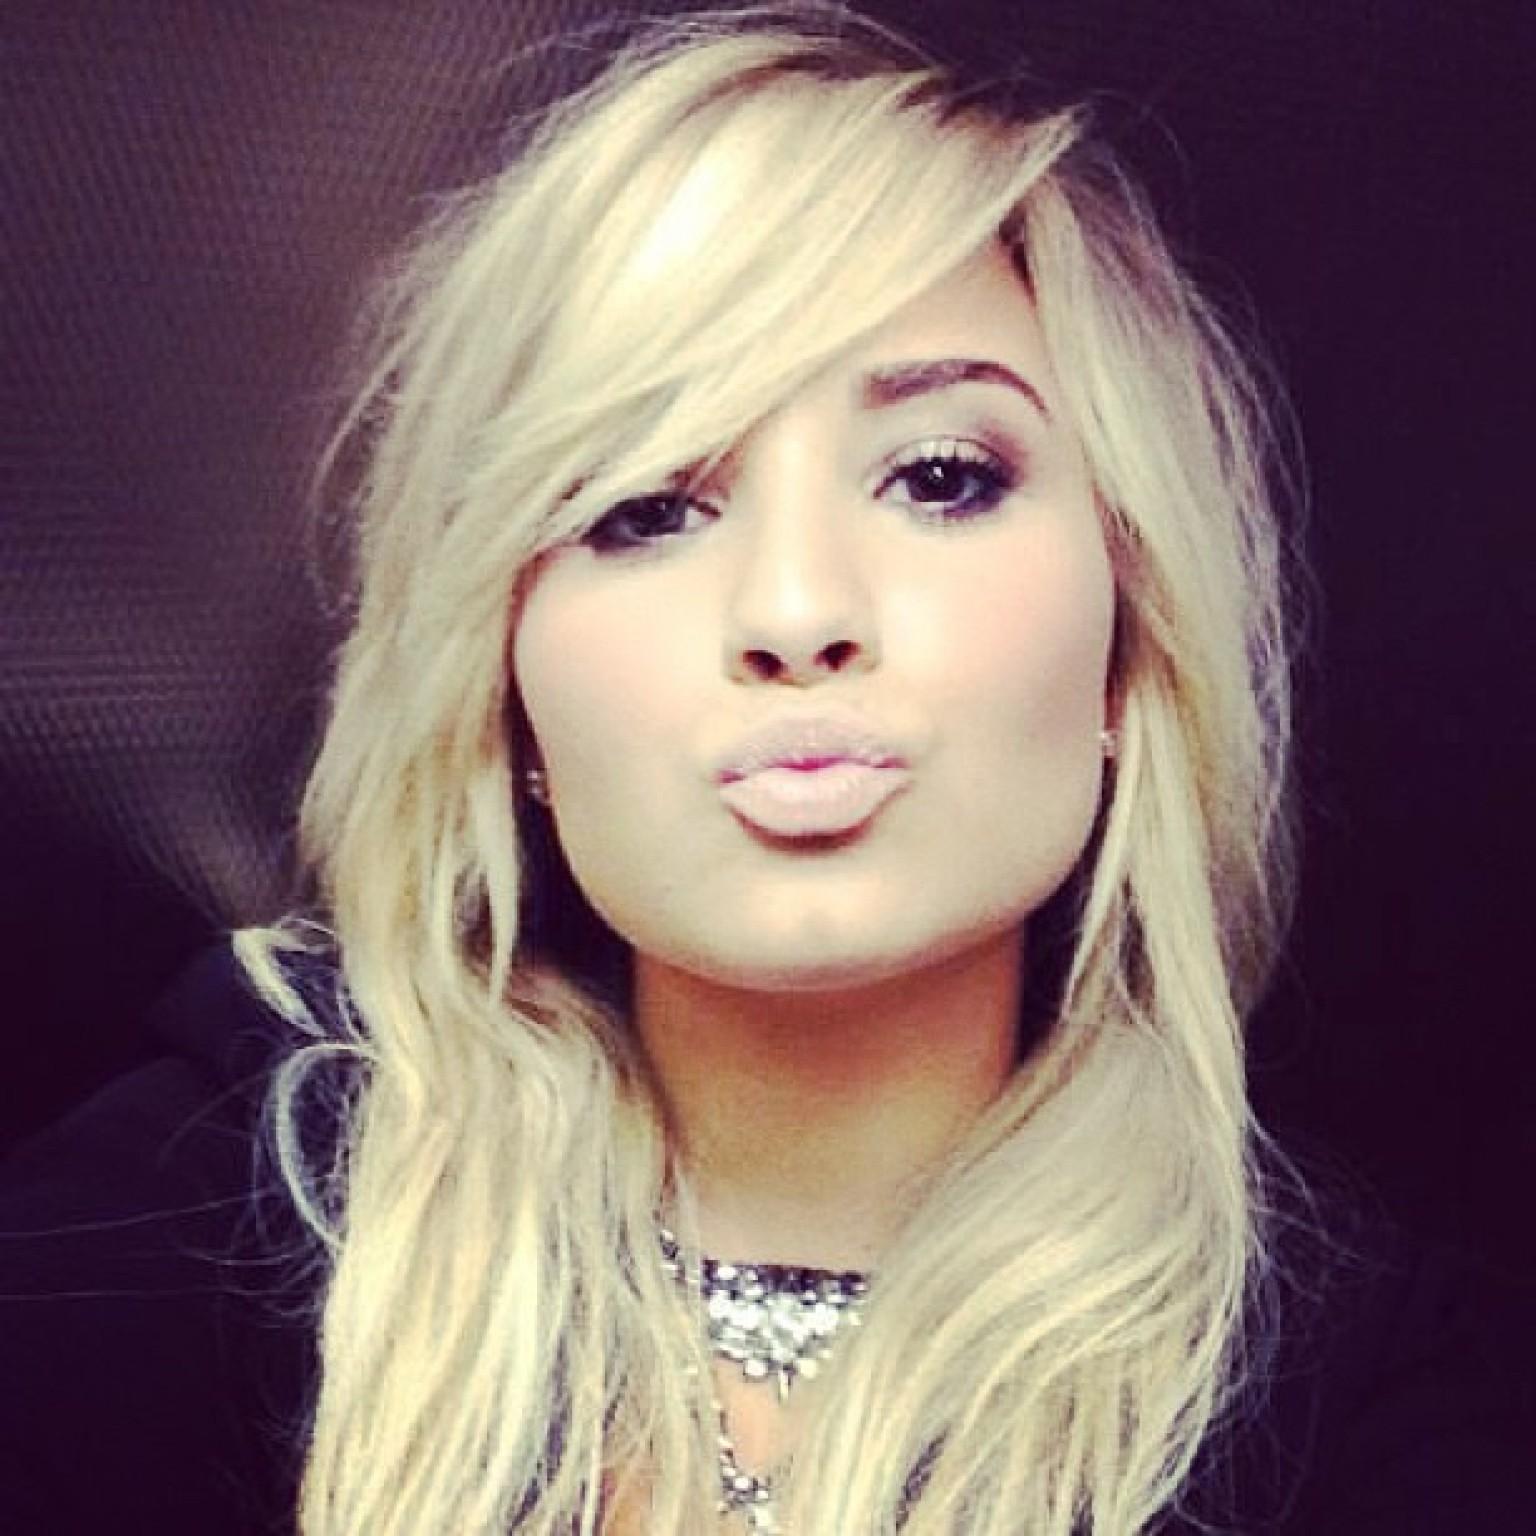 Wilmer Valderrama On Dating Ex Demi Lovato: 'She's Definitely Very Special To Me'